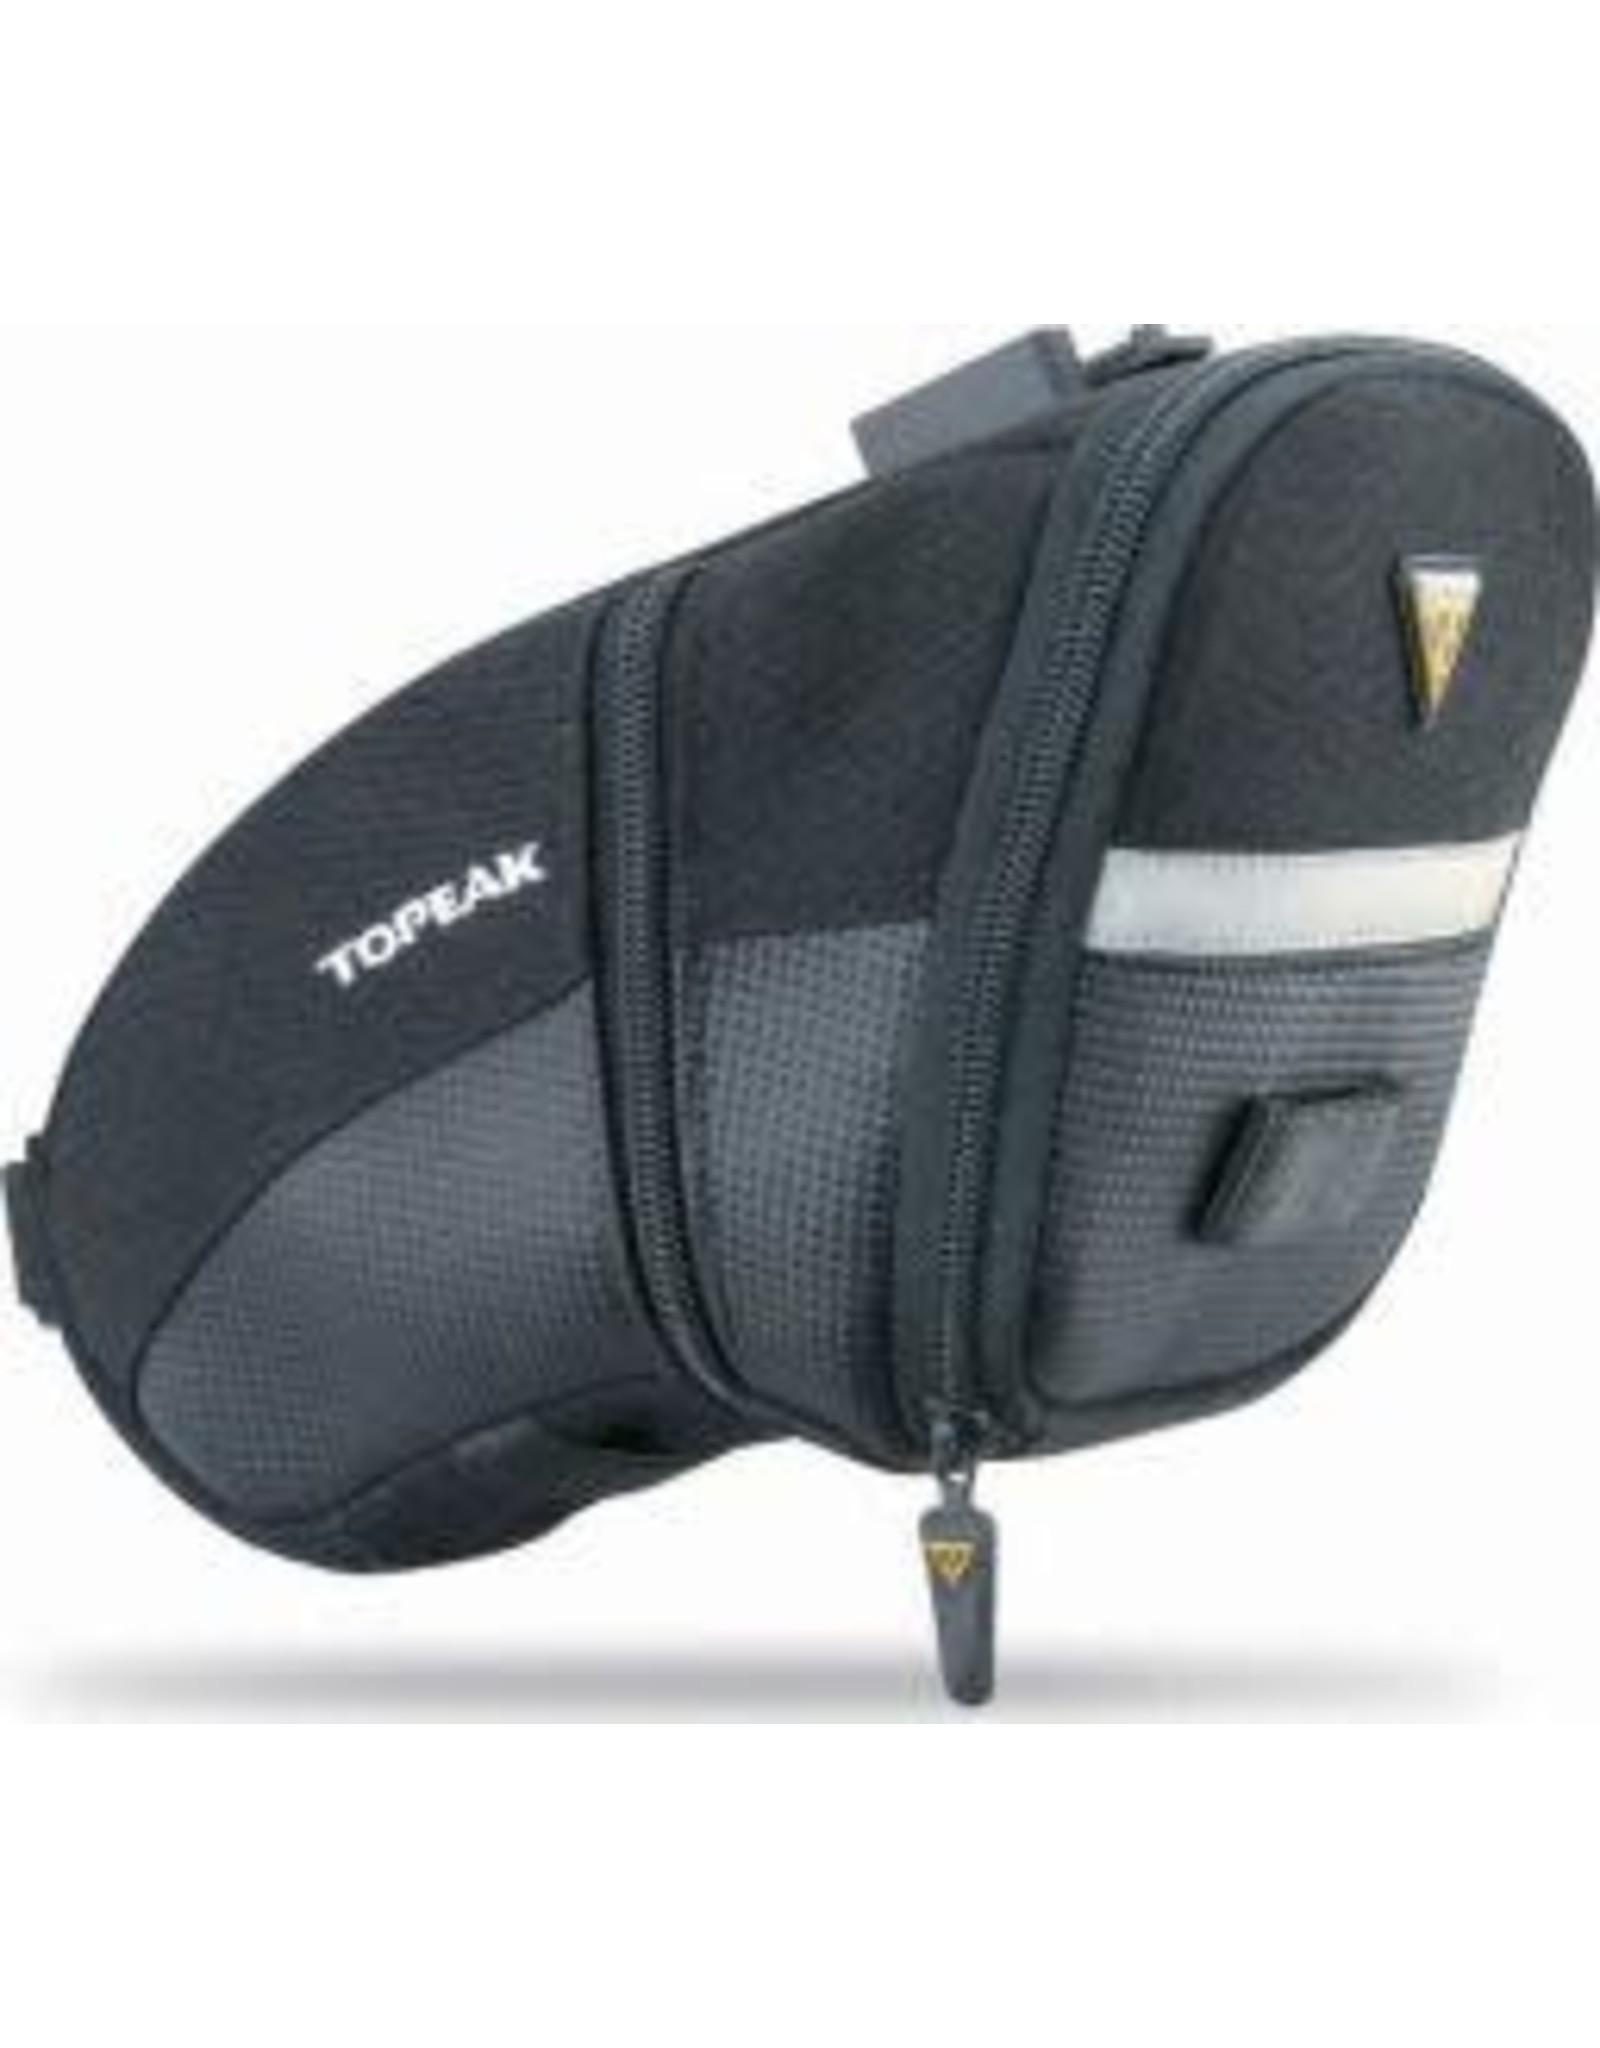 Topeak Topeak Aero Wedge quick click,black large seat bag